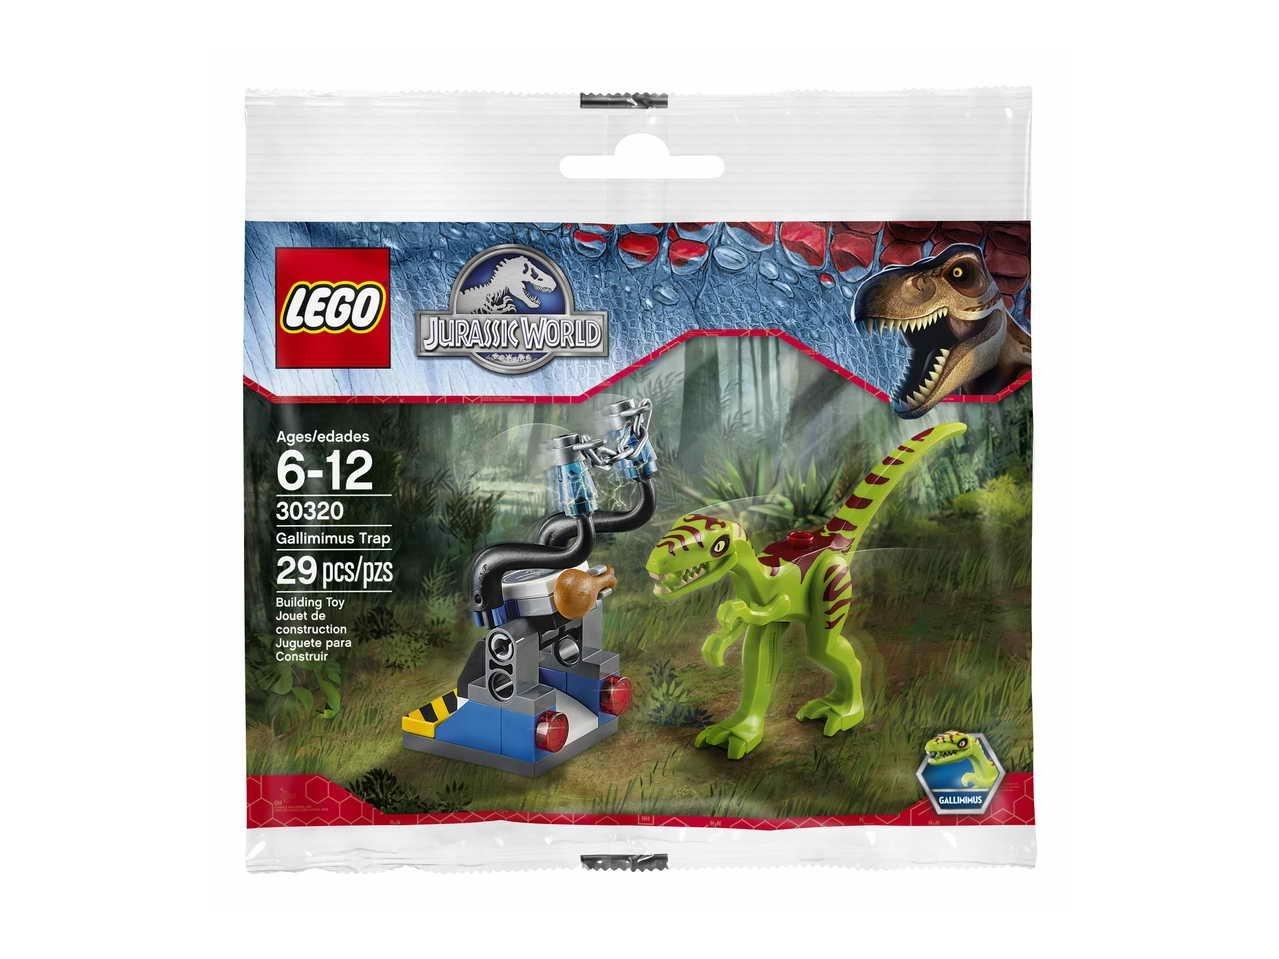 LEGO 30320 Jurassic World™ Gallimimus Trap